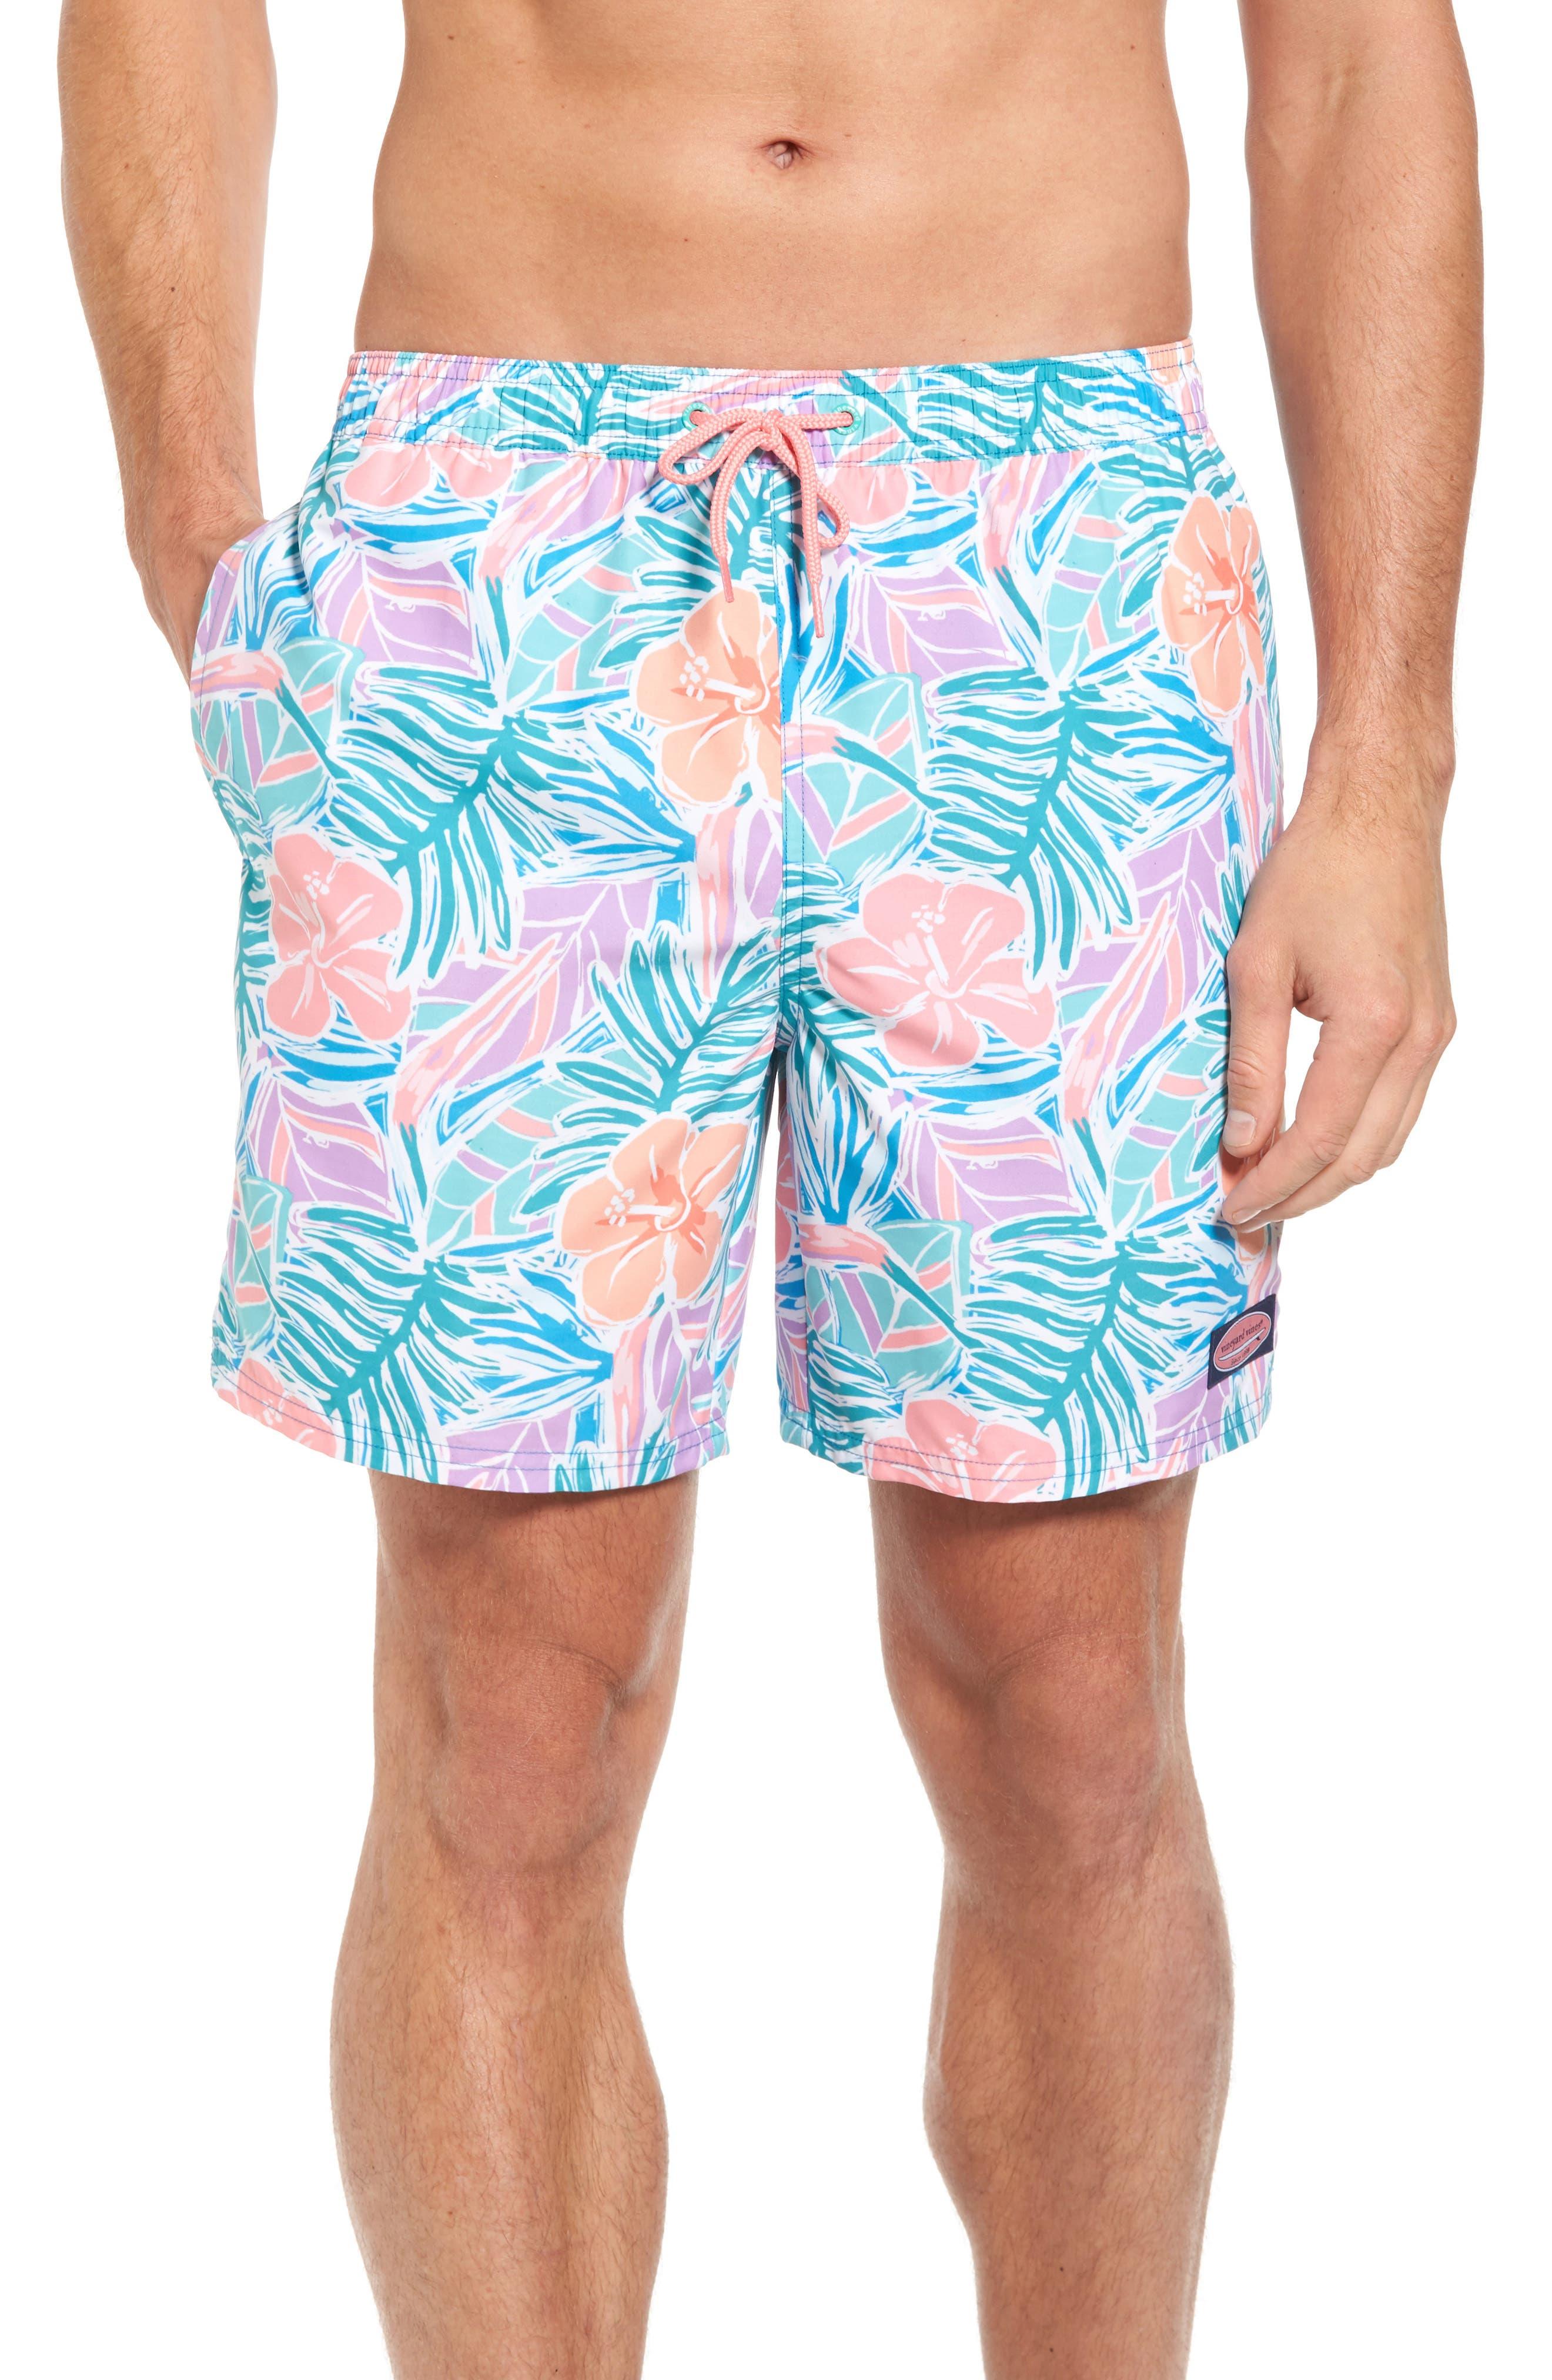 Chappy Gulf Tropical Print Swim Trunks,                         Main,                         color, 400